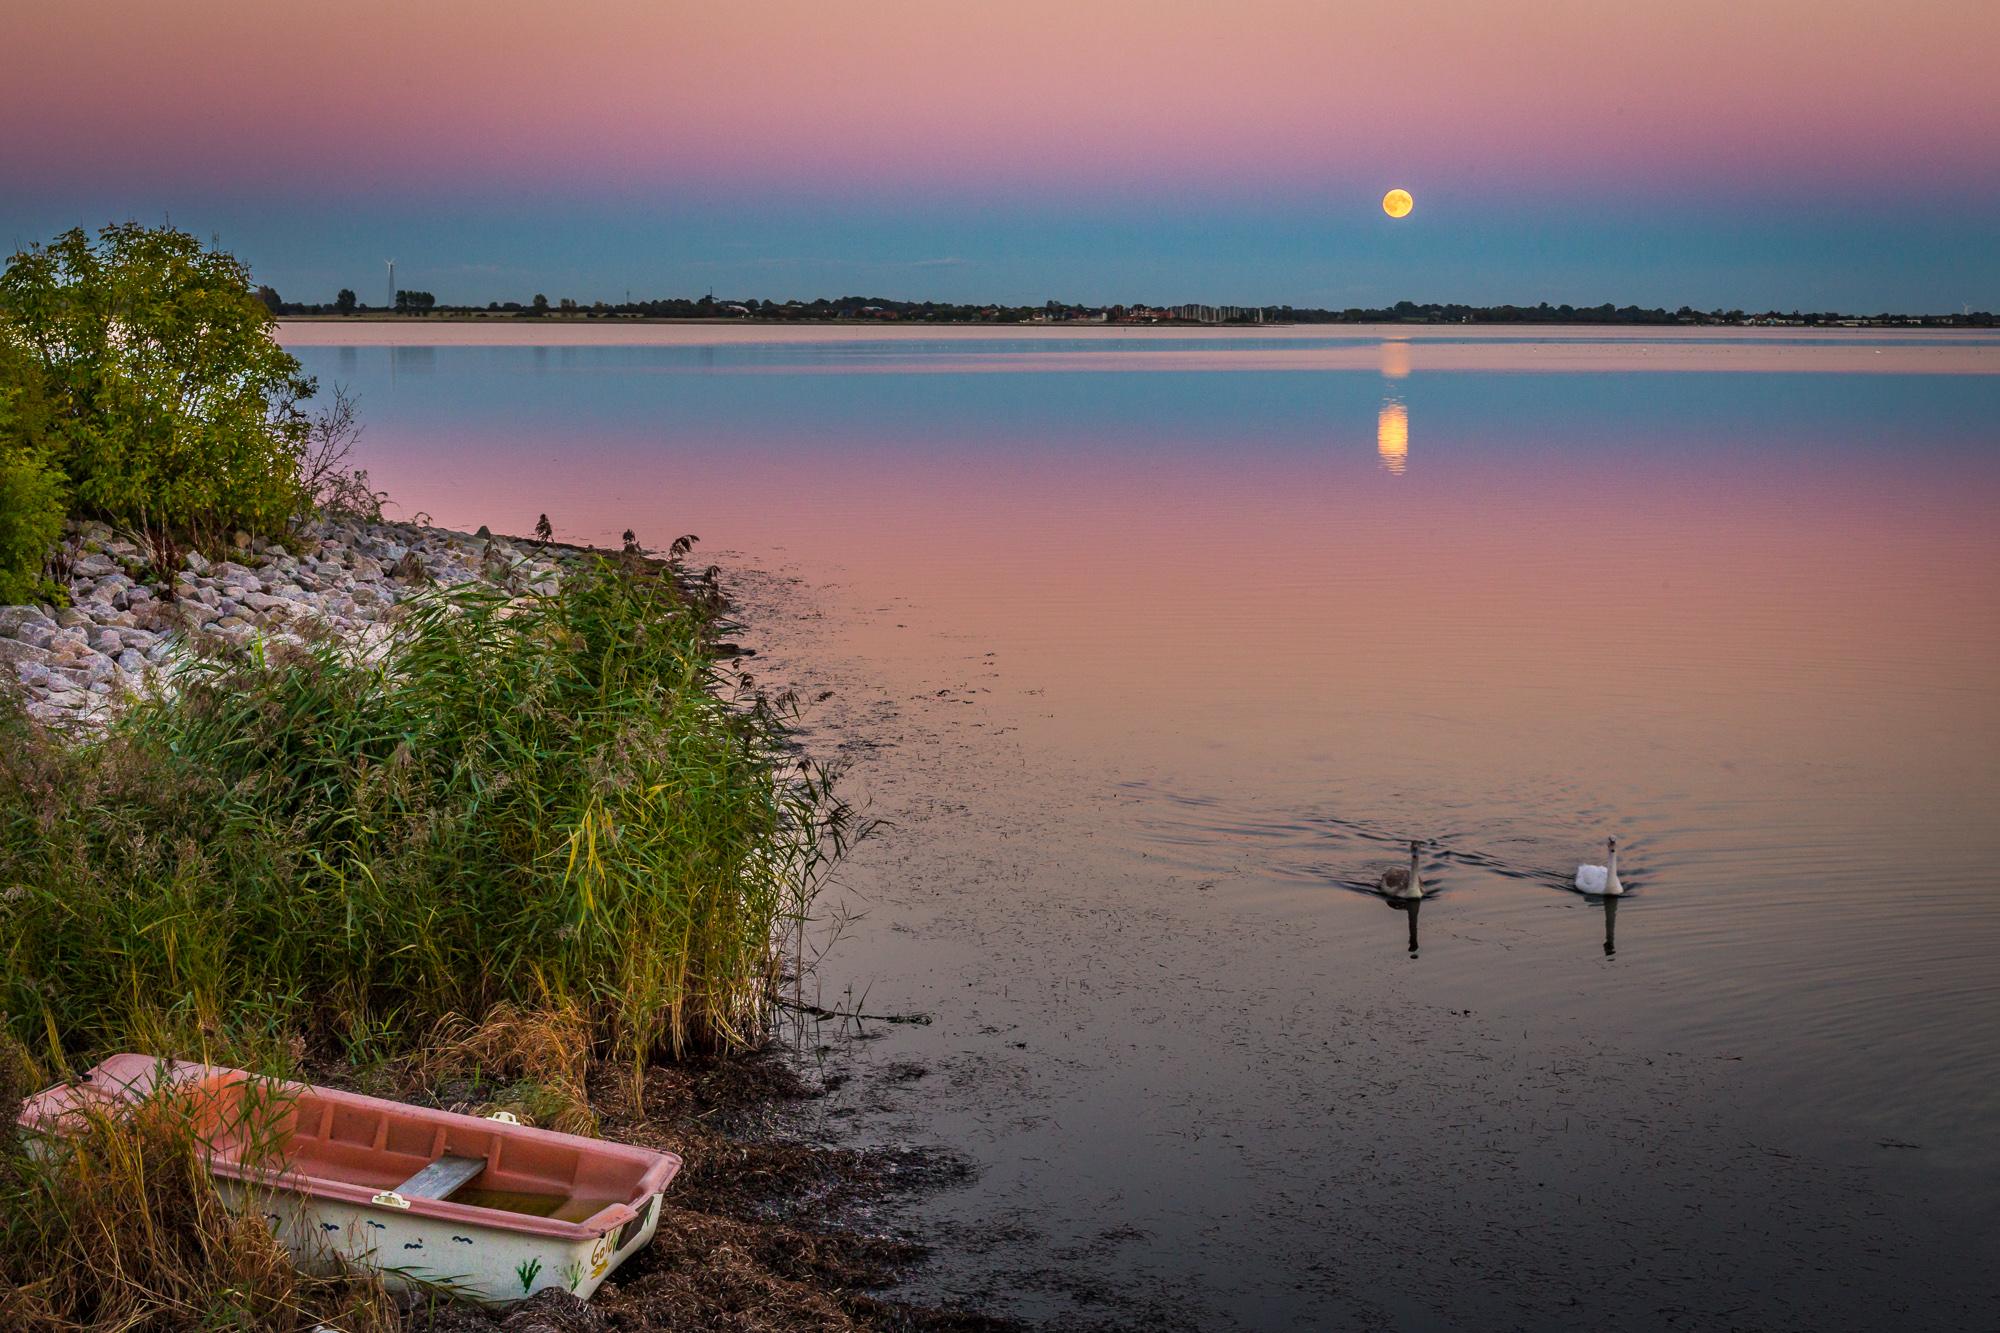 Mond Lemkenhafen Orth